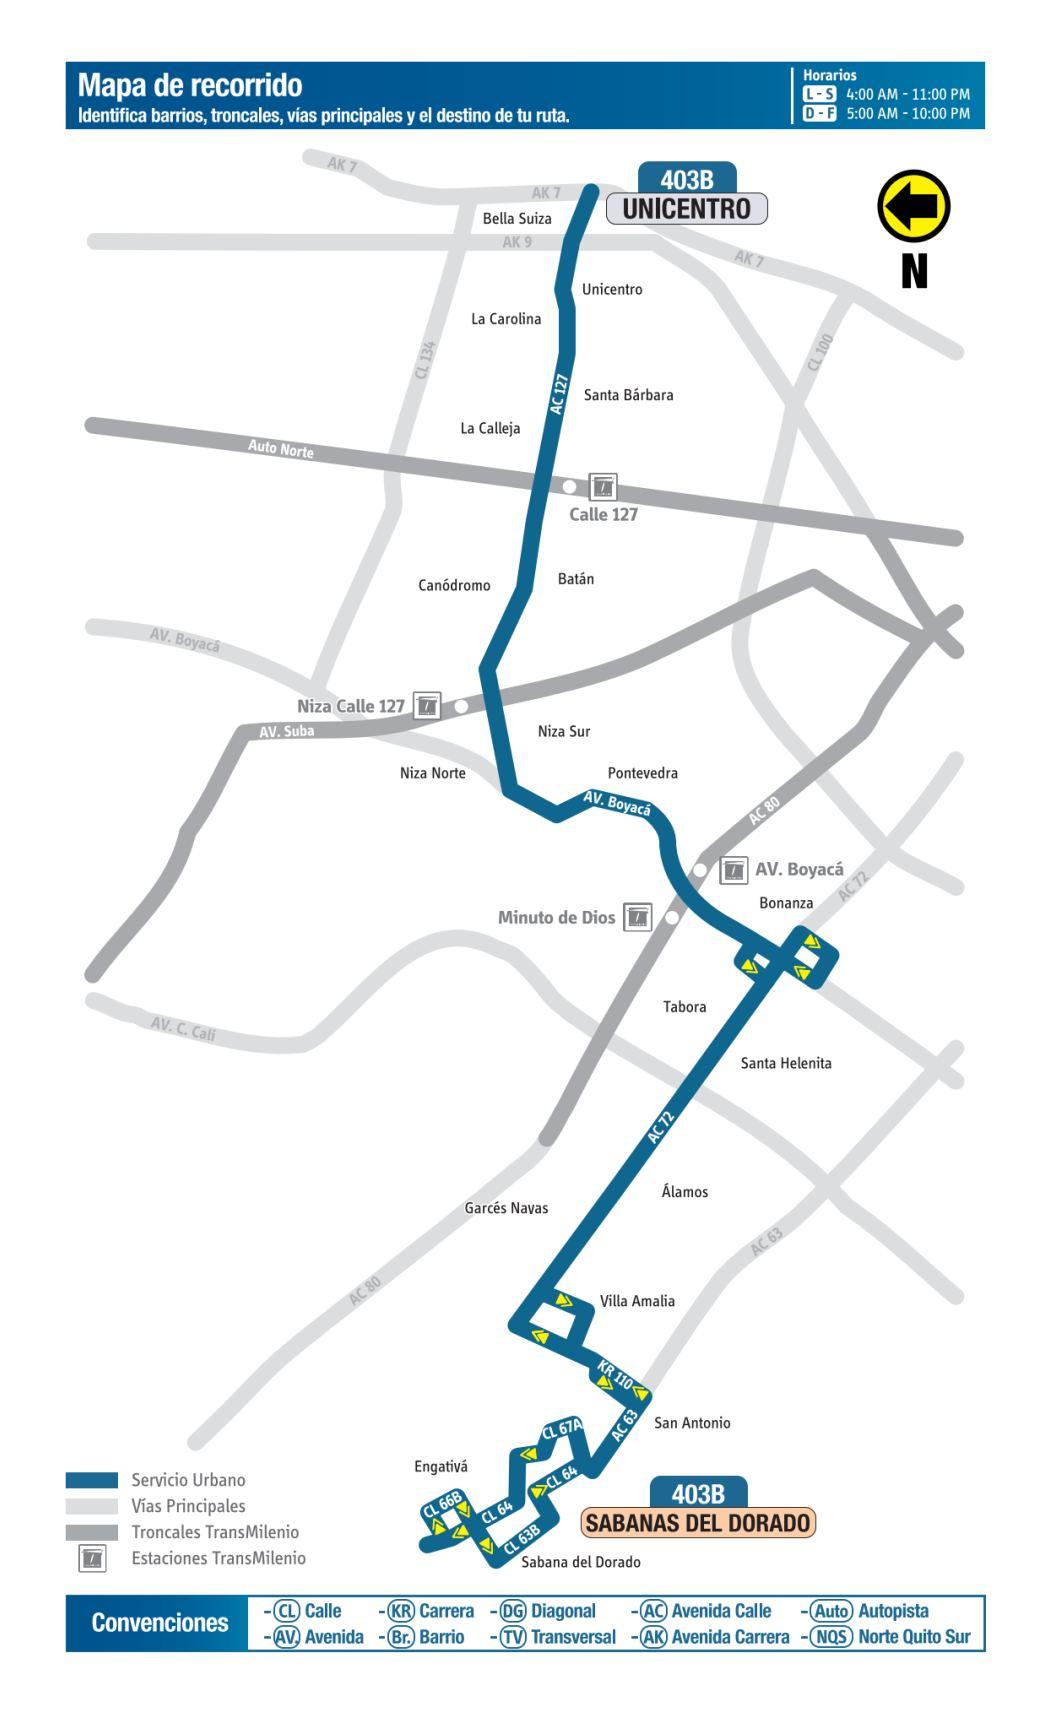 403B Engativá - Unicentro, mapa bus urbano Bogotá